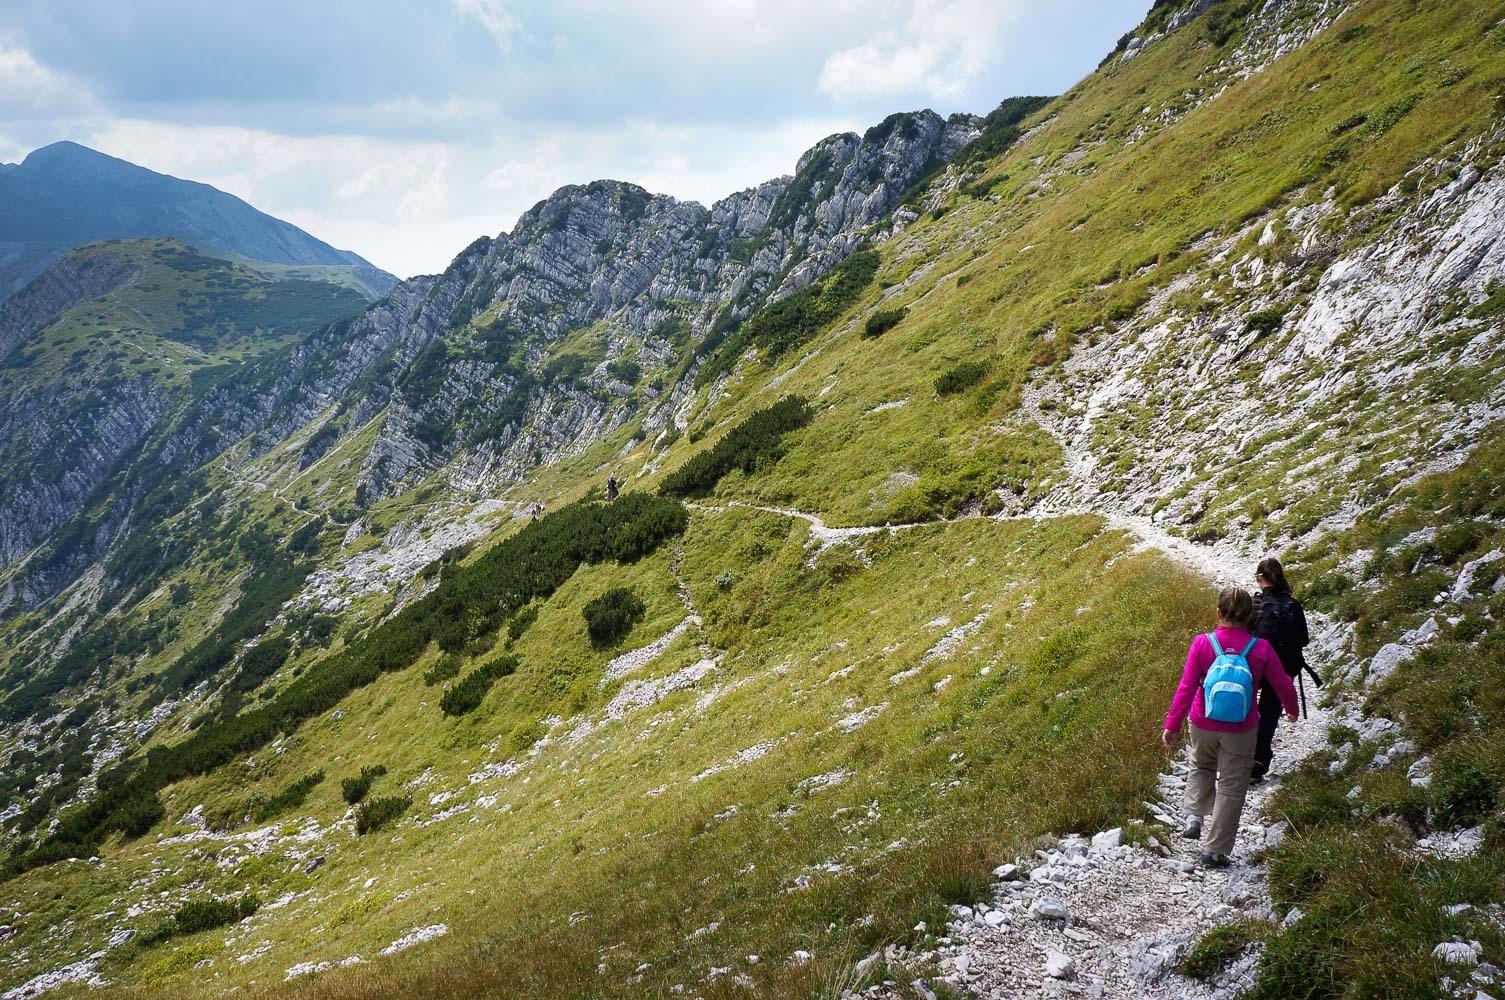 Baraka – Júliai-Alpok gyalogtúra